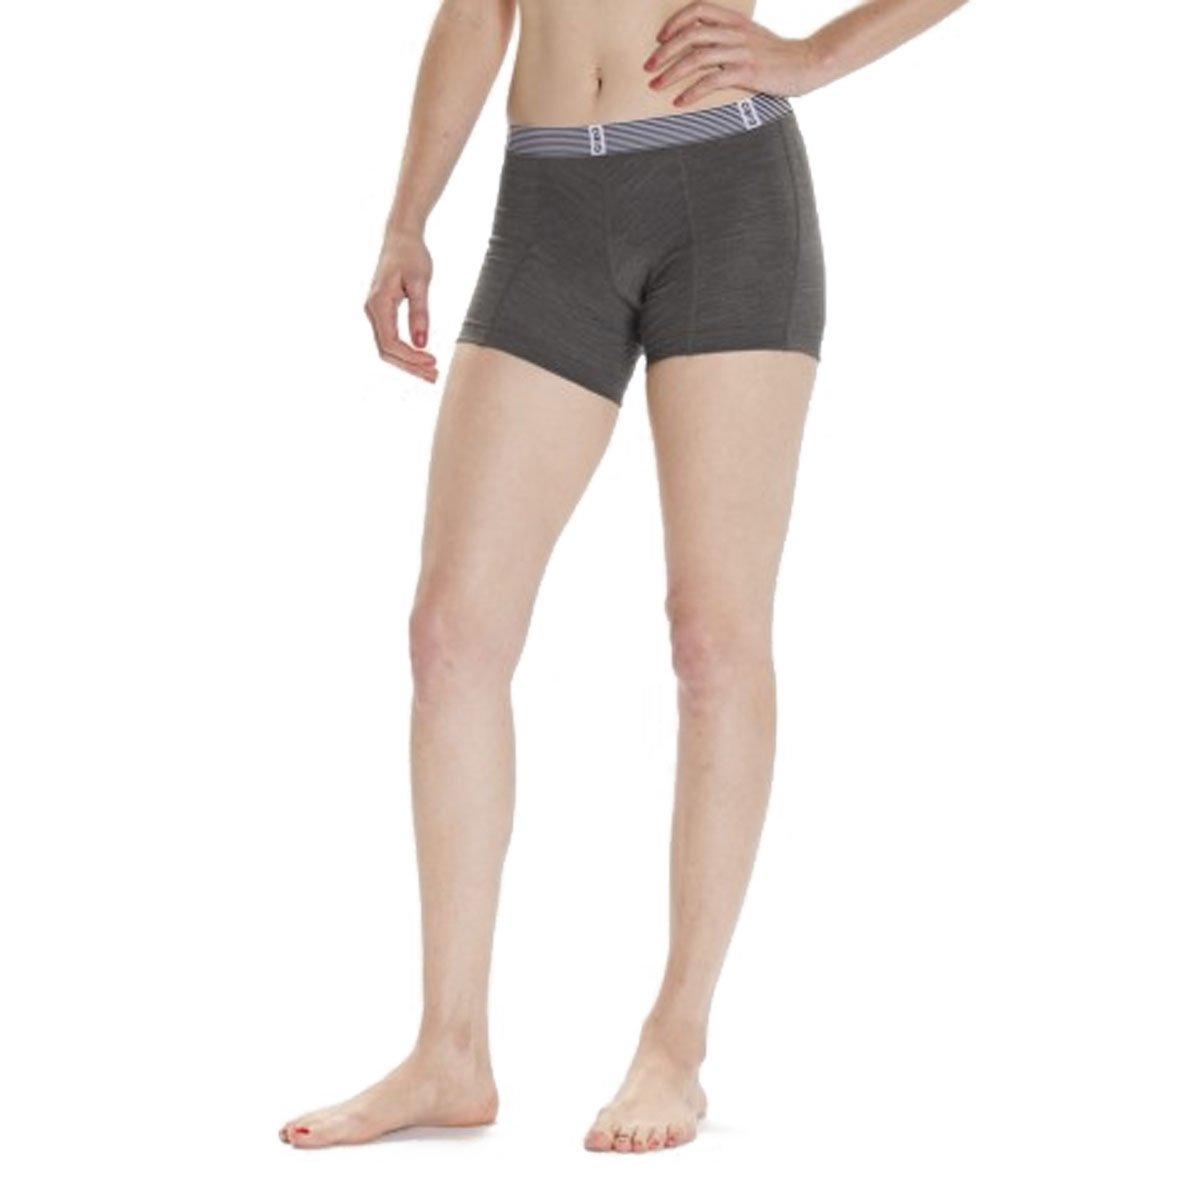 Giro Mtb Girls Shorts Boy - Undershort Dark Shadow (X-Large , Grau)